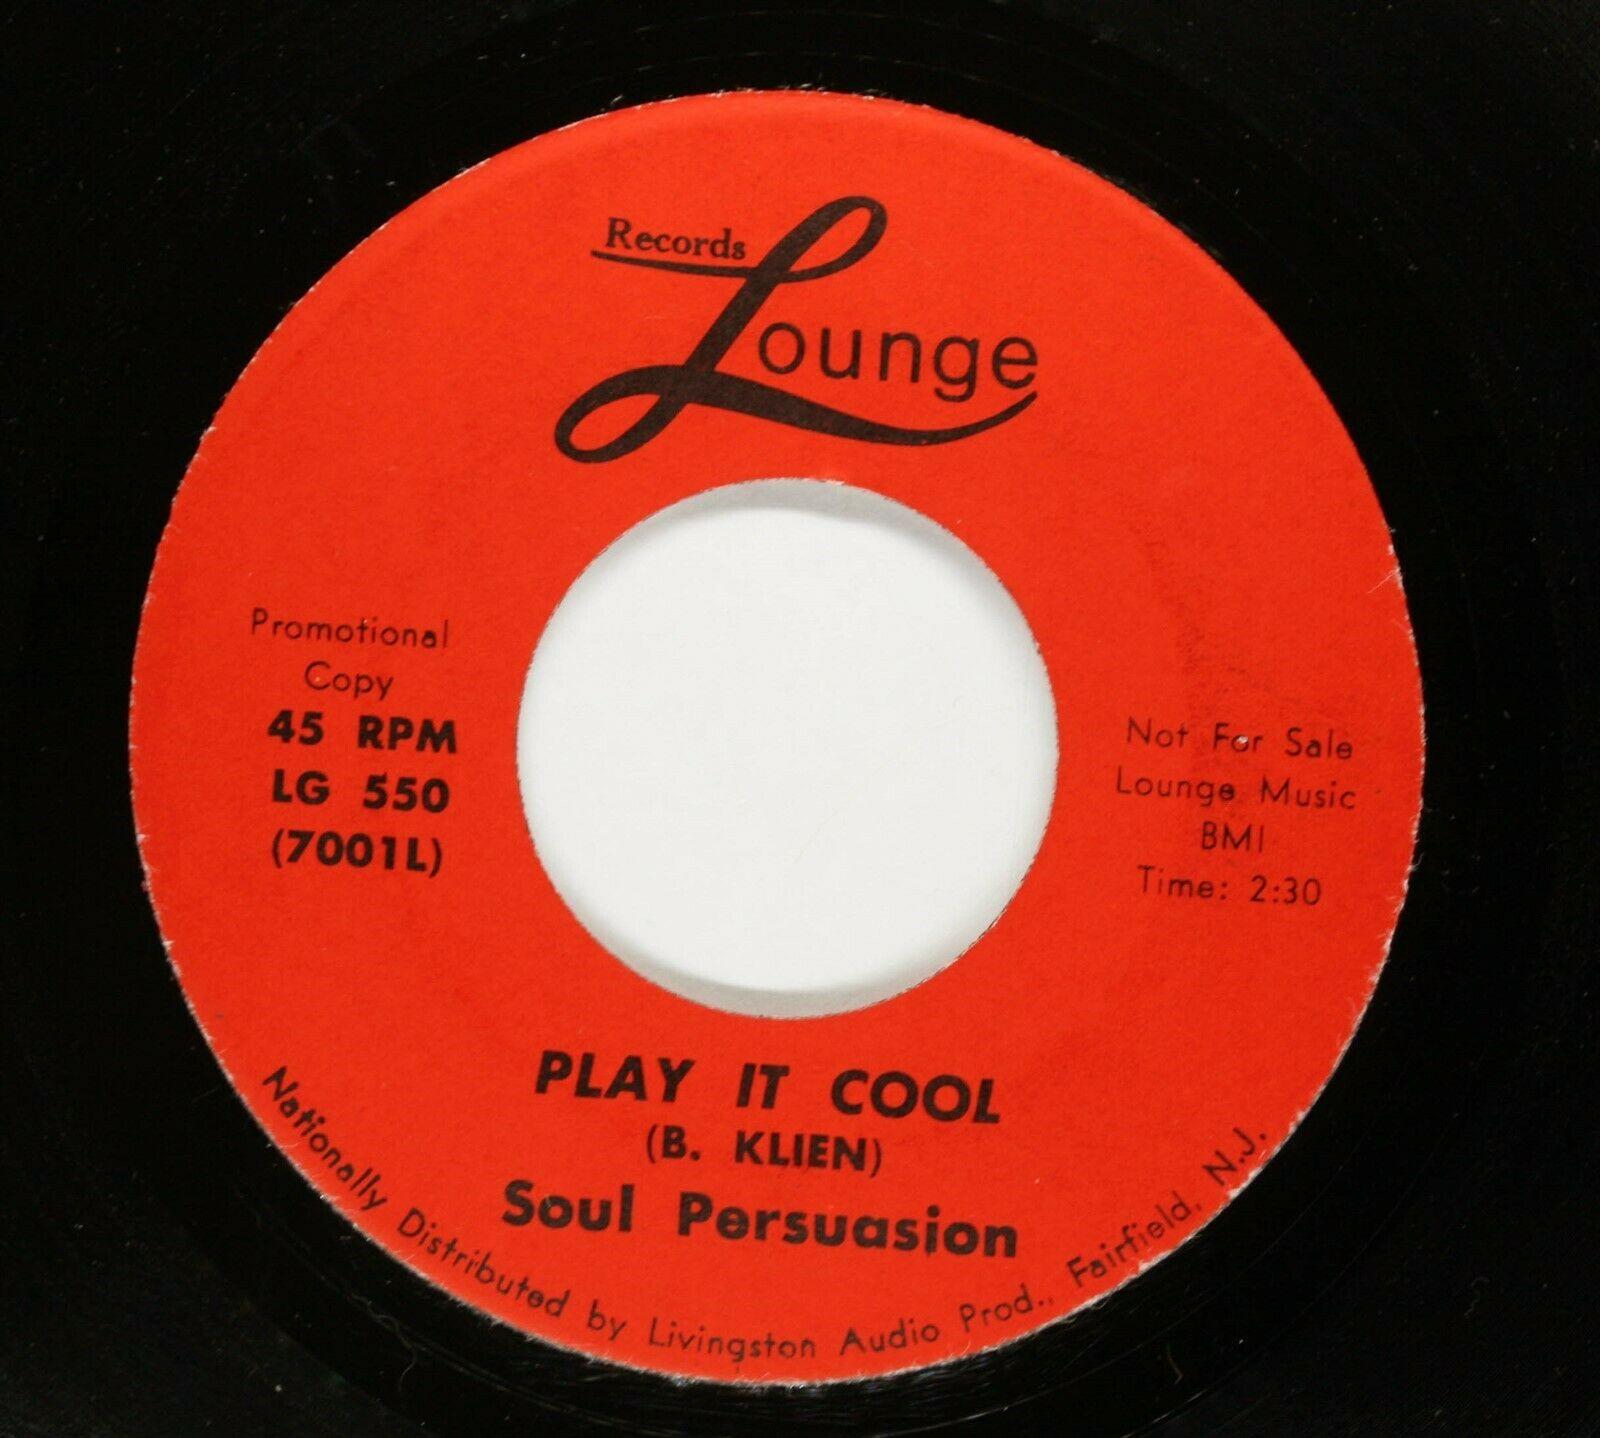 SOUL PERSUASION Sweet Soul Funk PROMO 45rpm Hey World b w Play It Cool HEAR